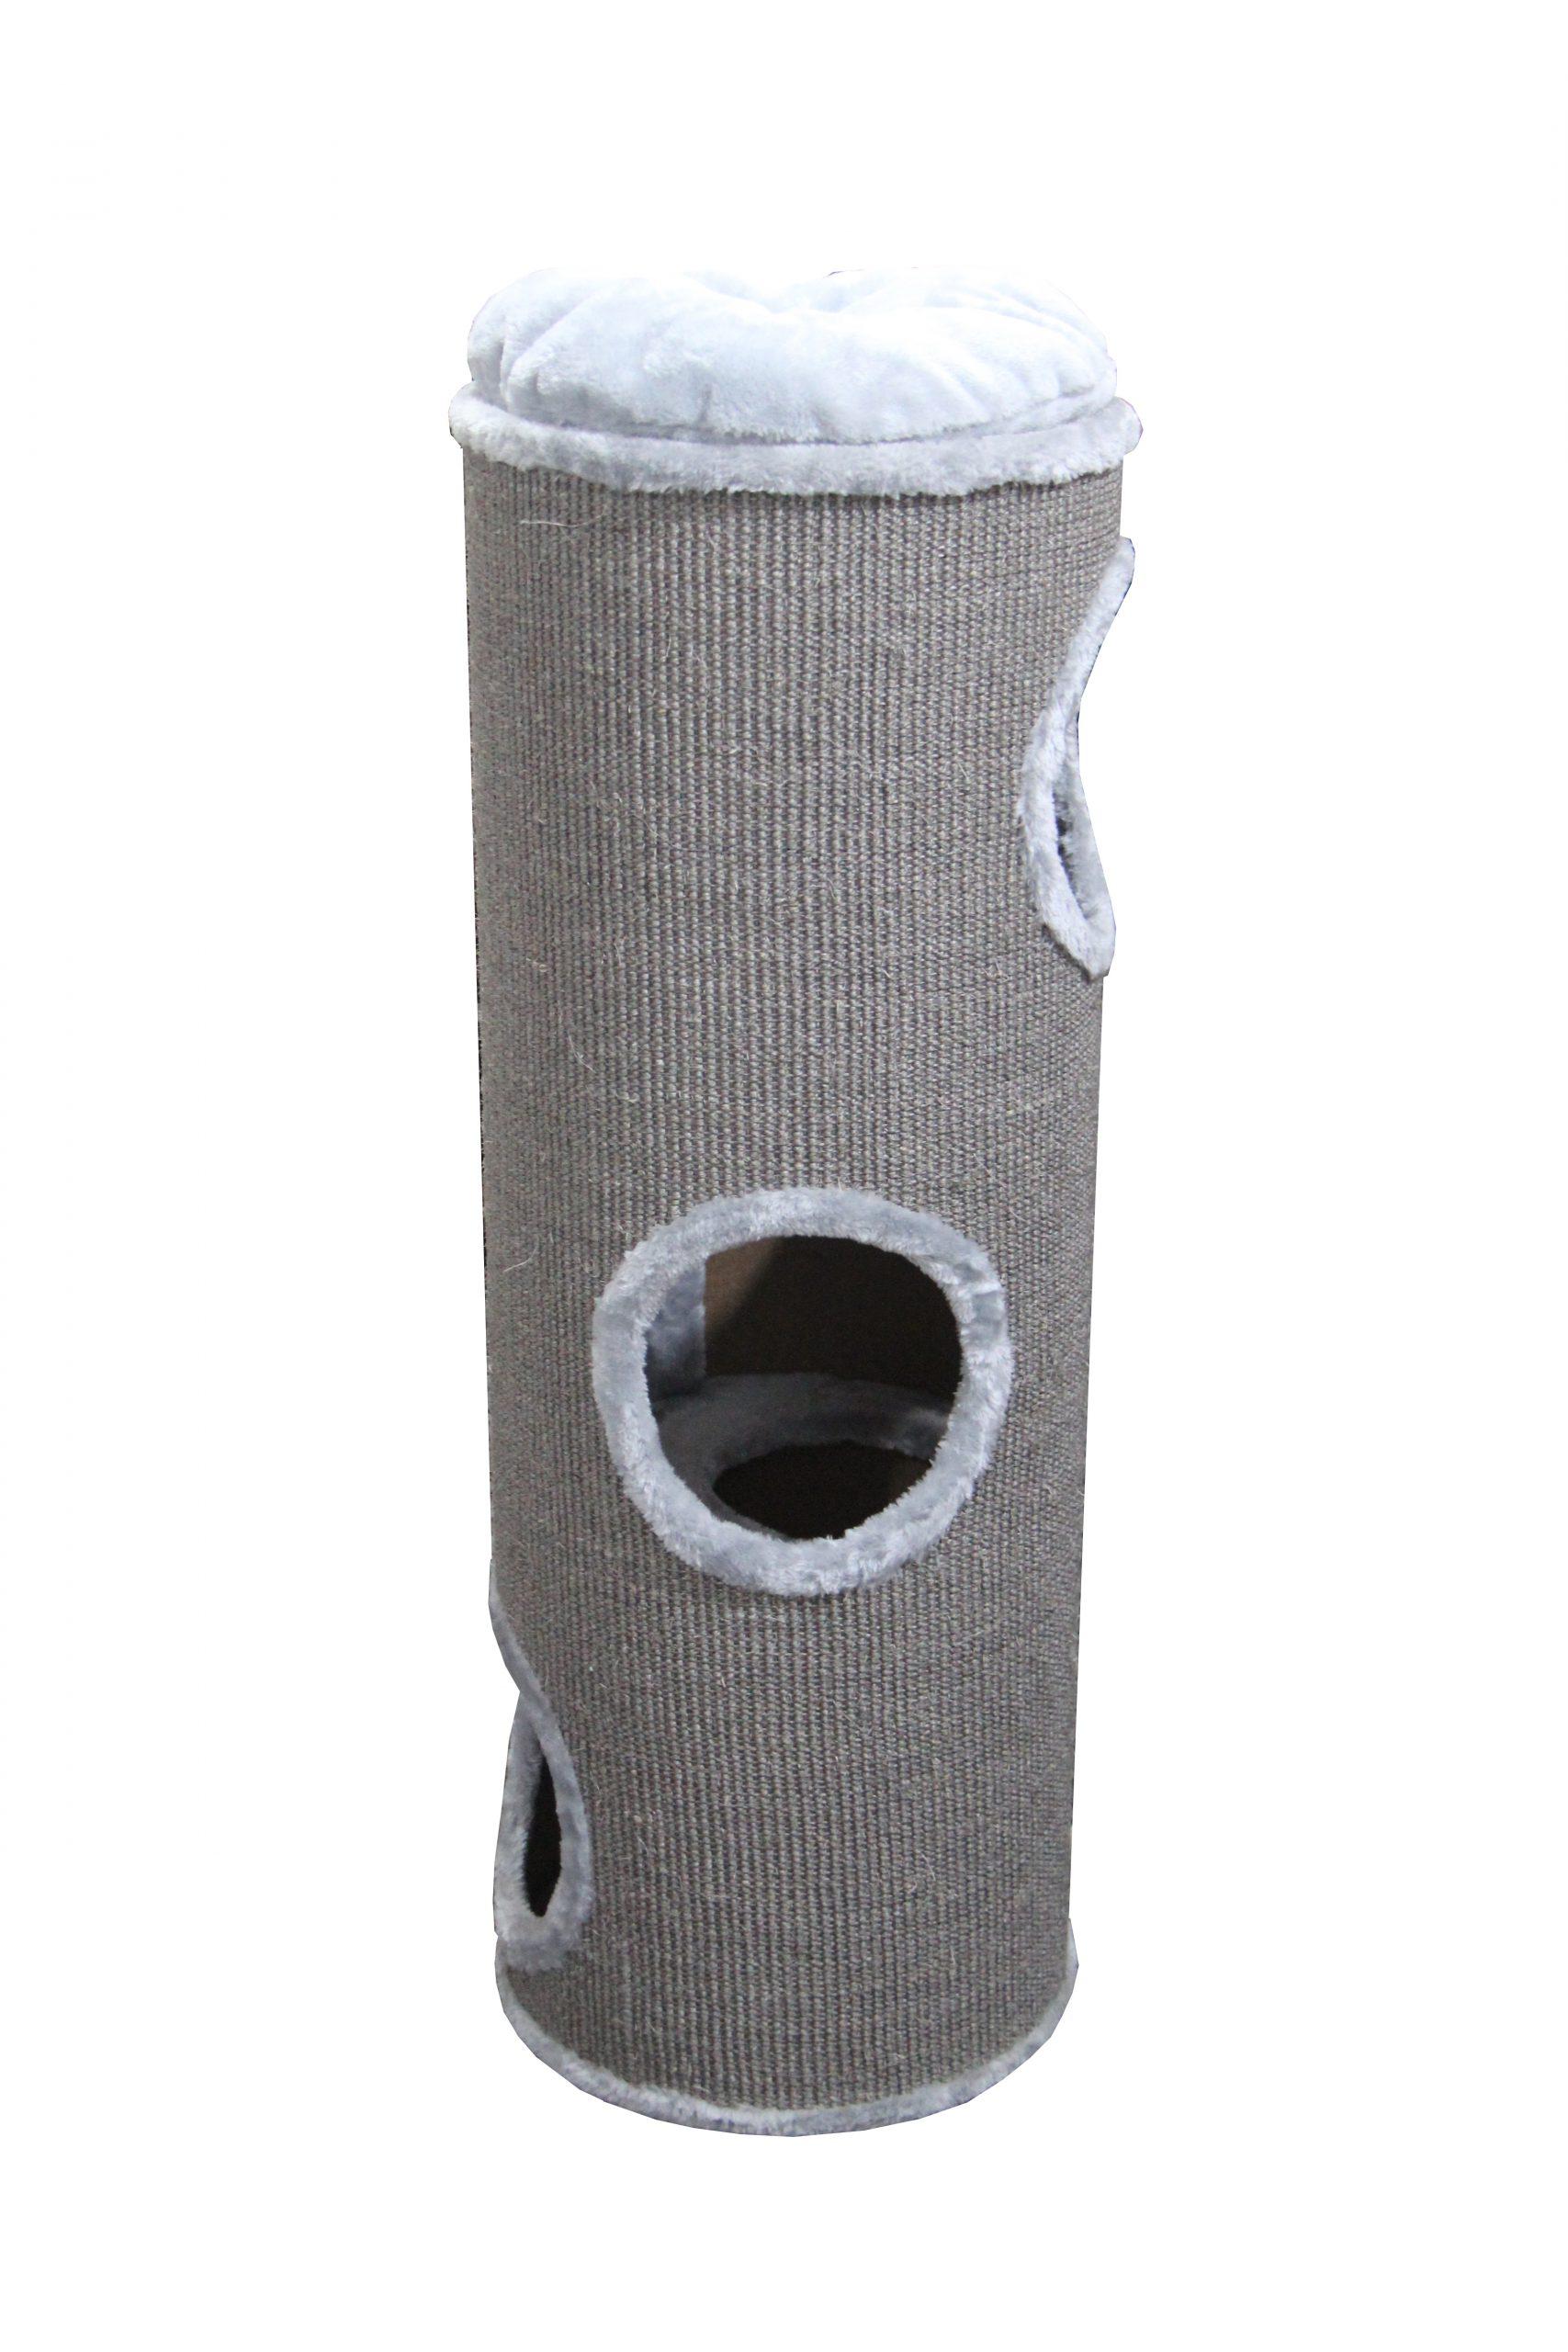 Adori-Krabton-Nala-Grijs-Krabpaal-40x40x100-cm